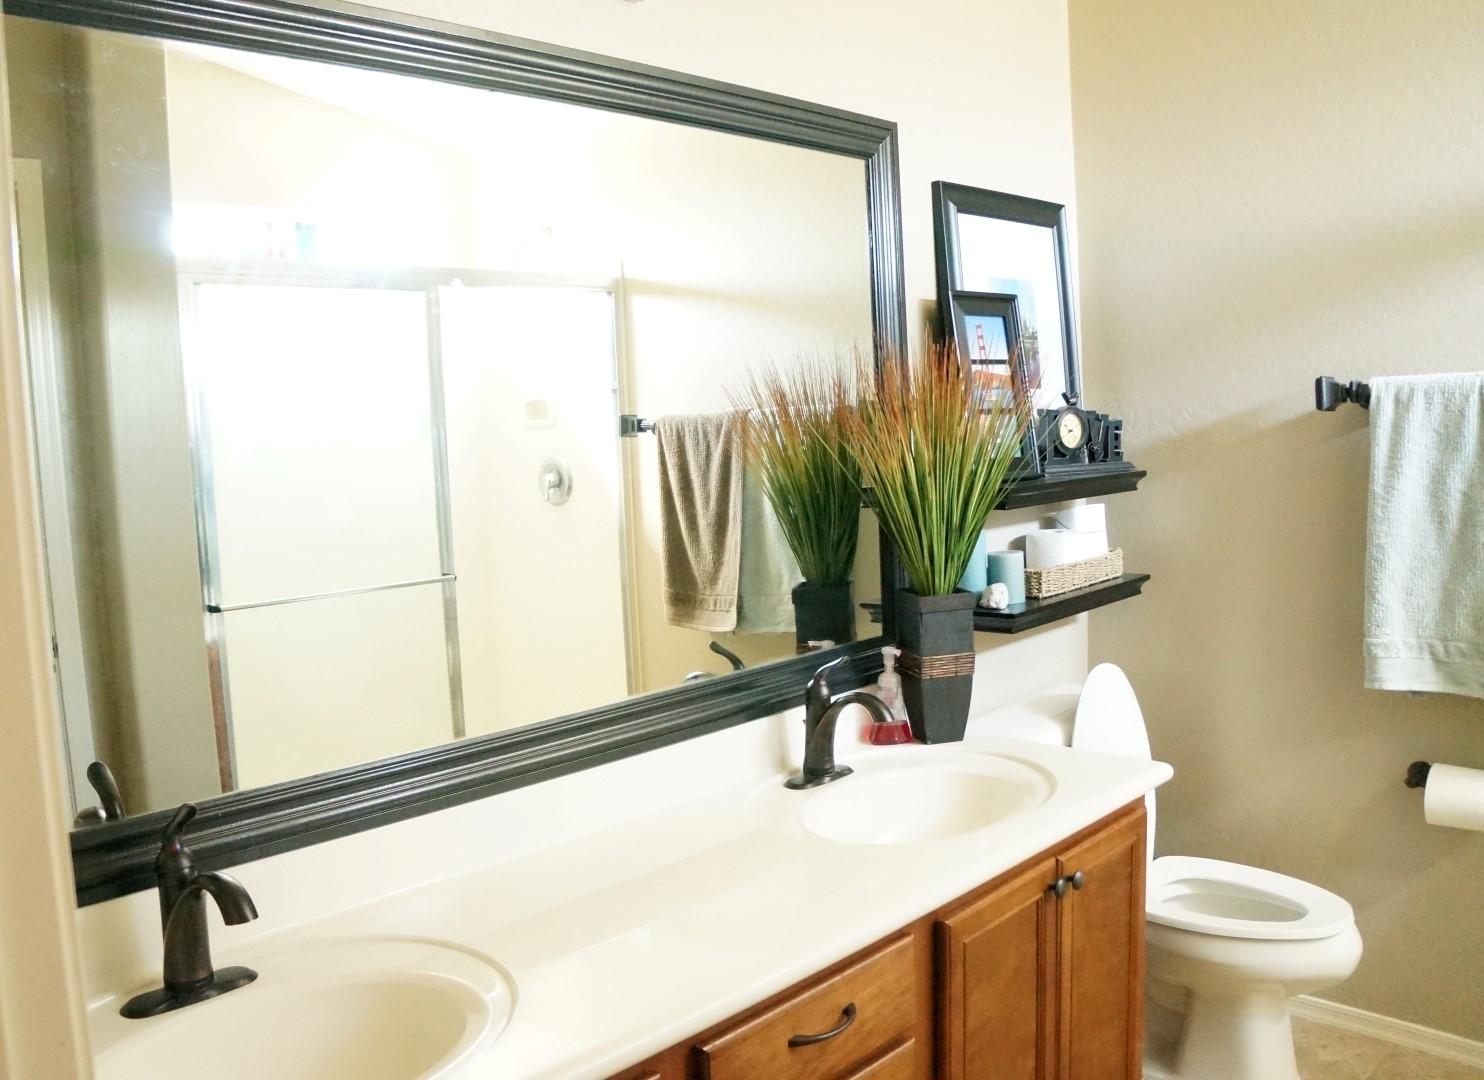 Framed Mirrors For The Bathroom